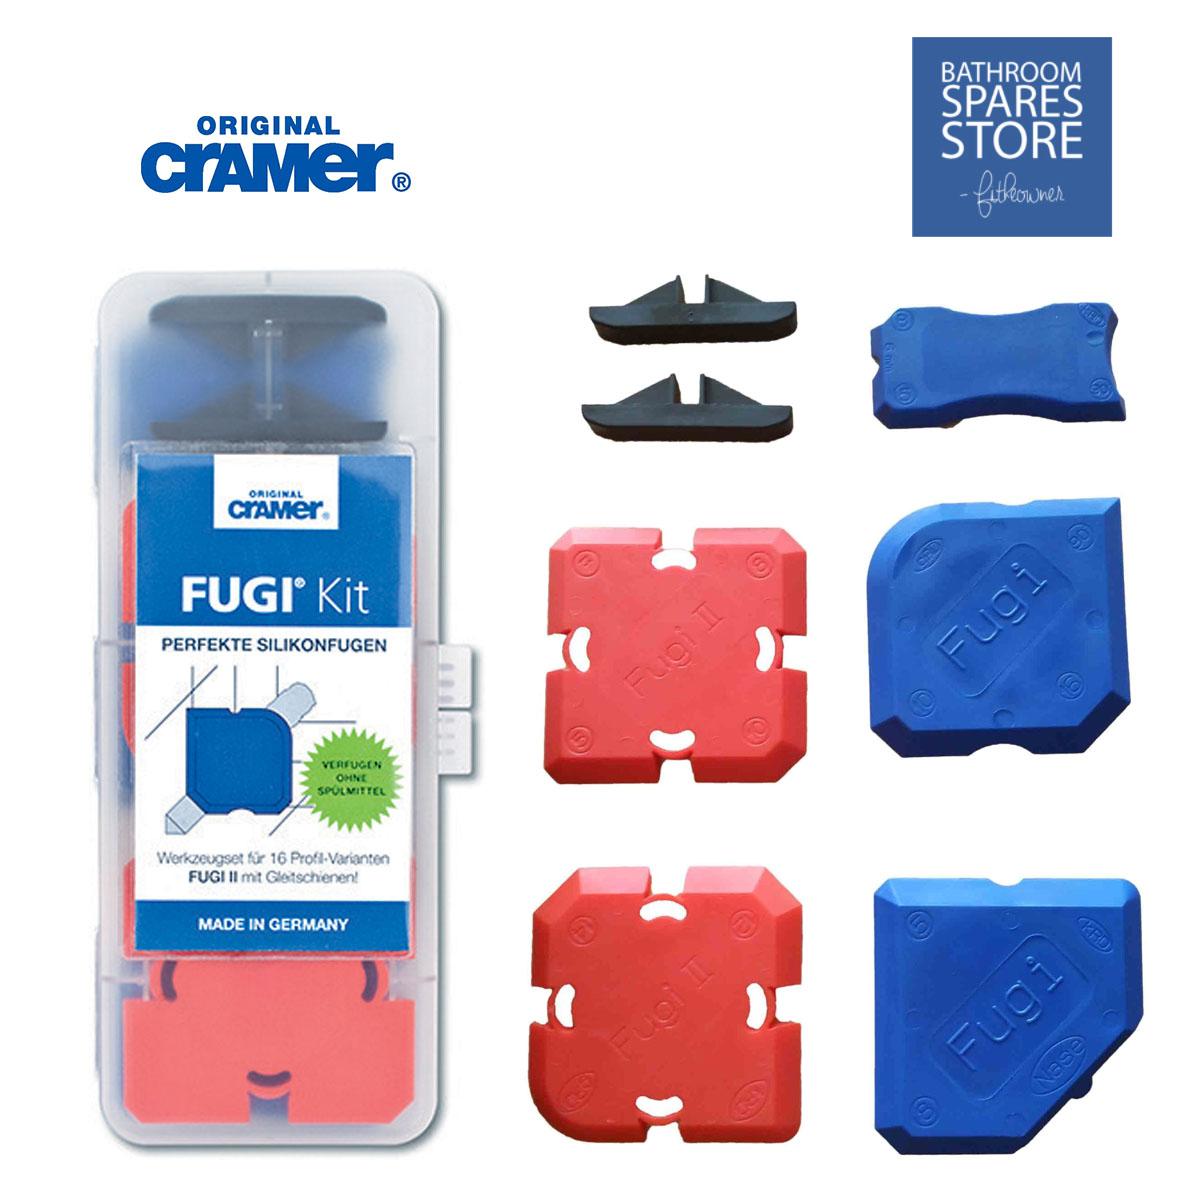 cramer fugi kit instructions